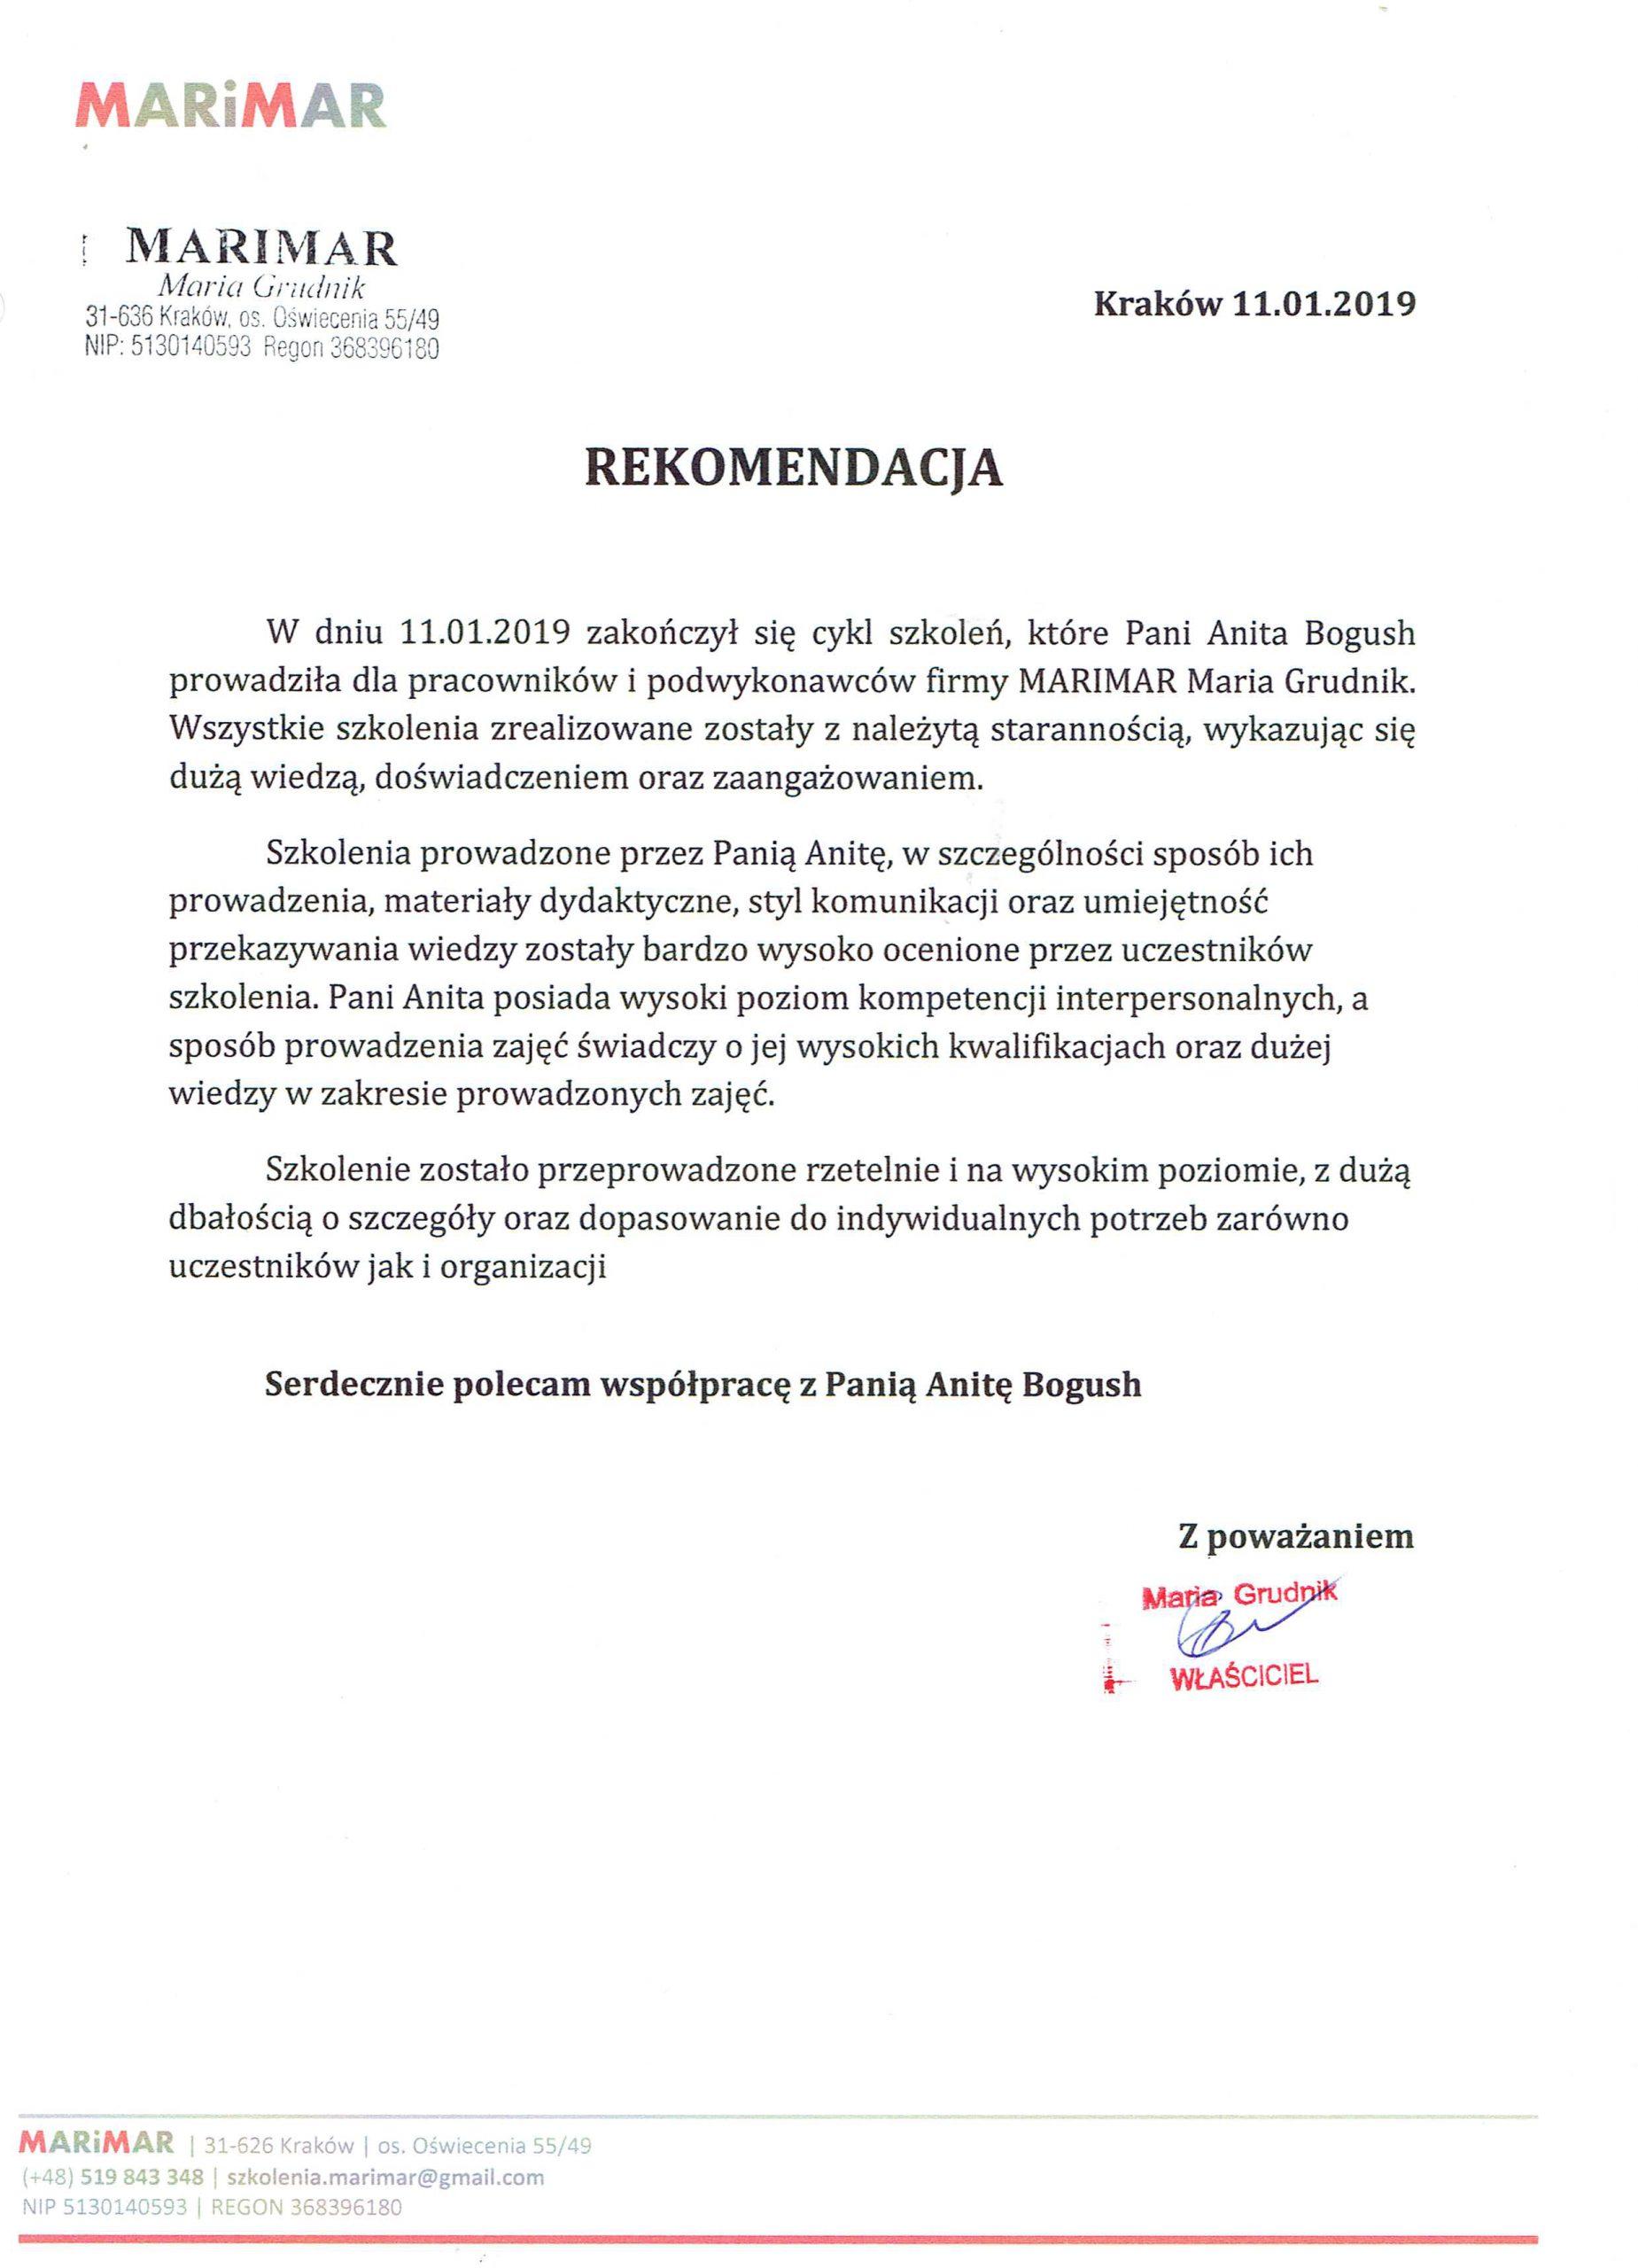 MARIMAR Maria Grudnik